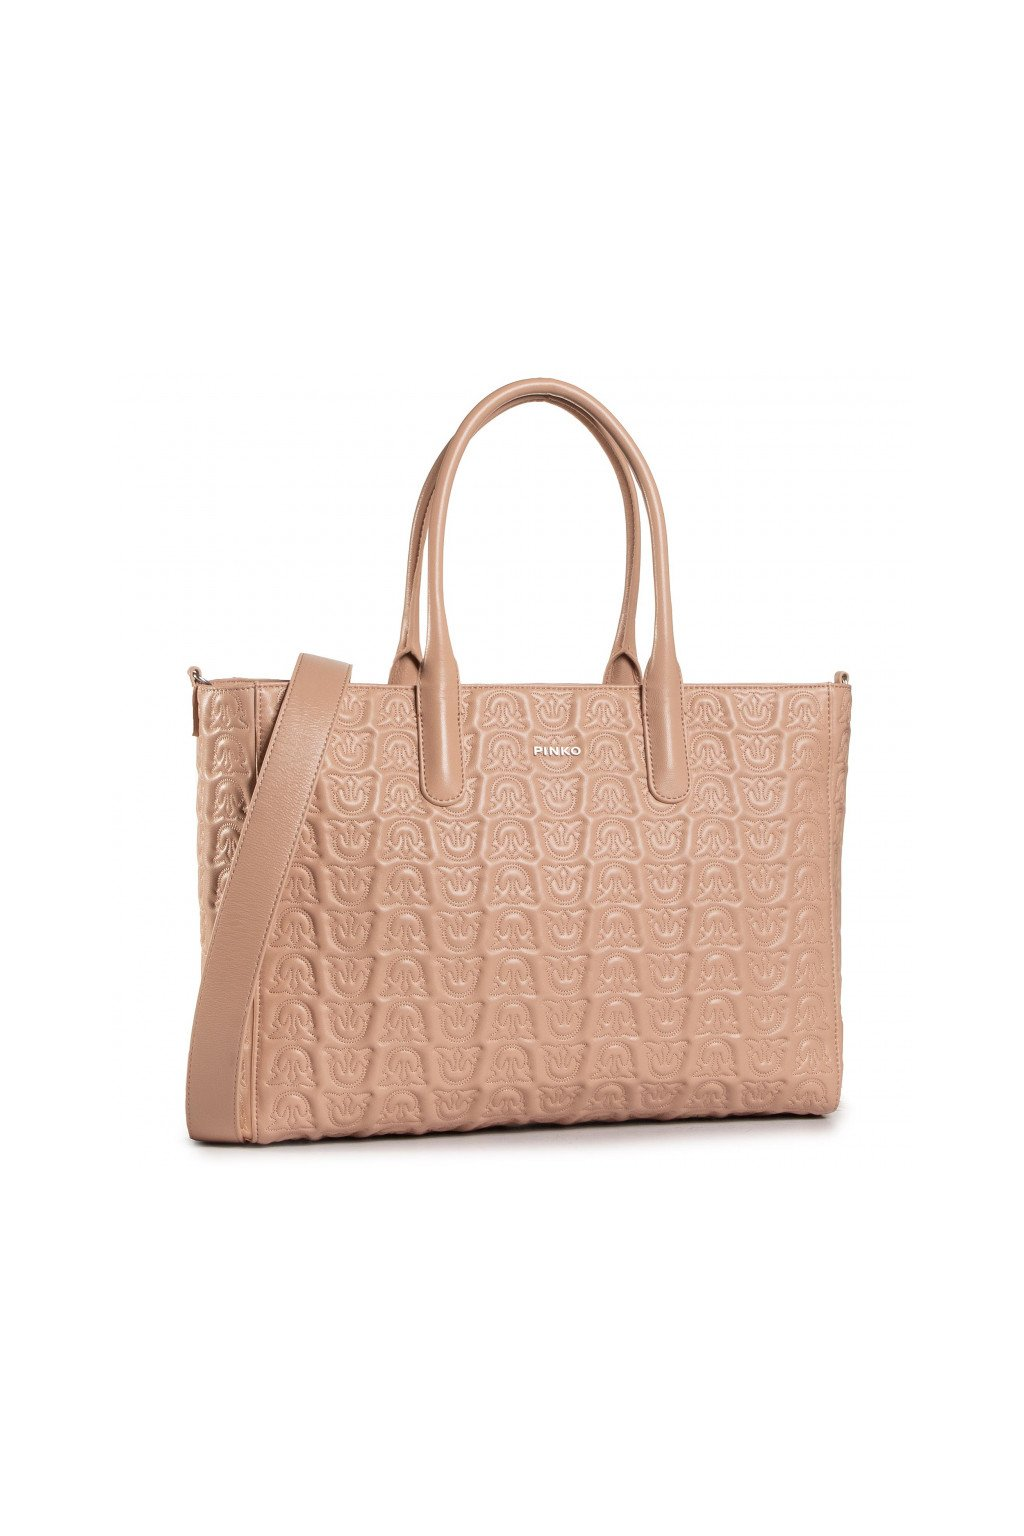 1P21XS Y6NXQ19 Dámská kabelka Pinko Love Shopping Monogram Leather růžová